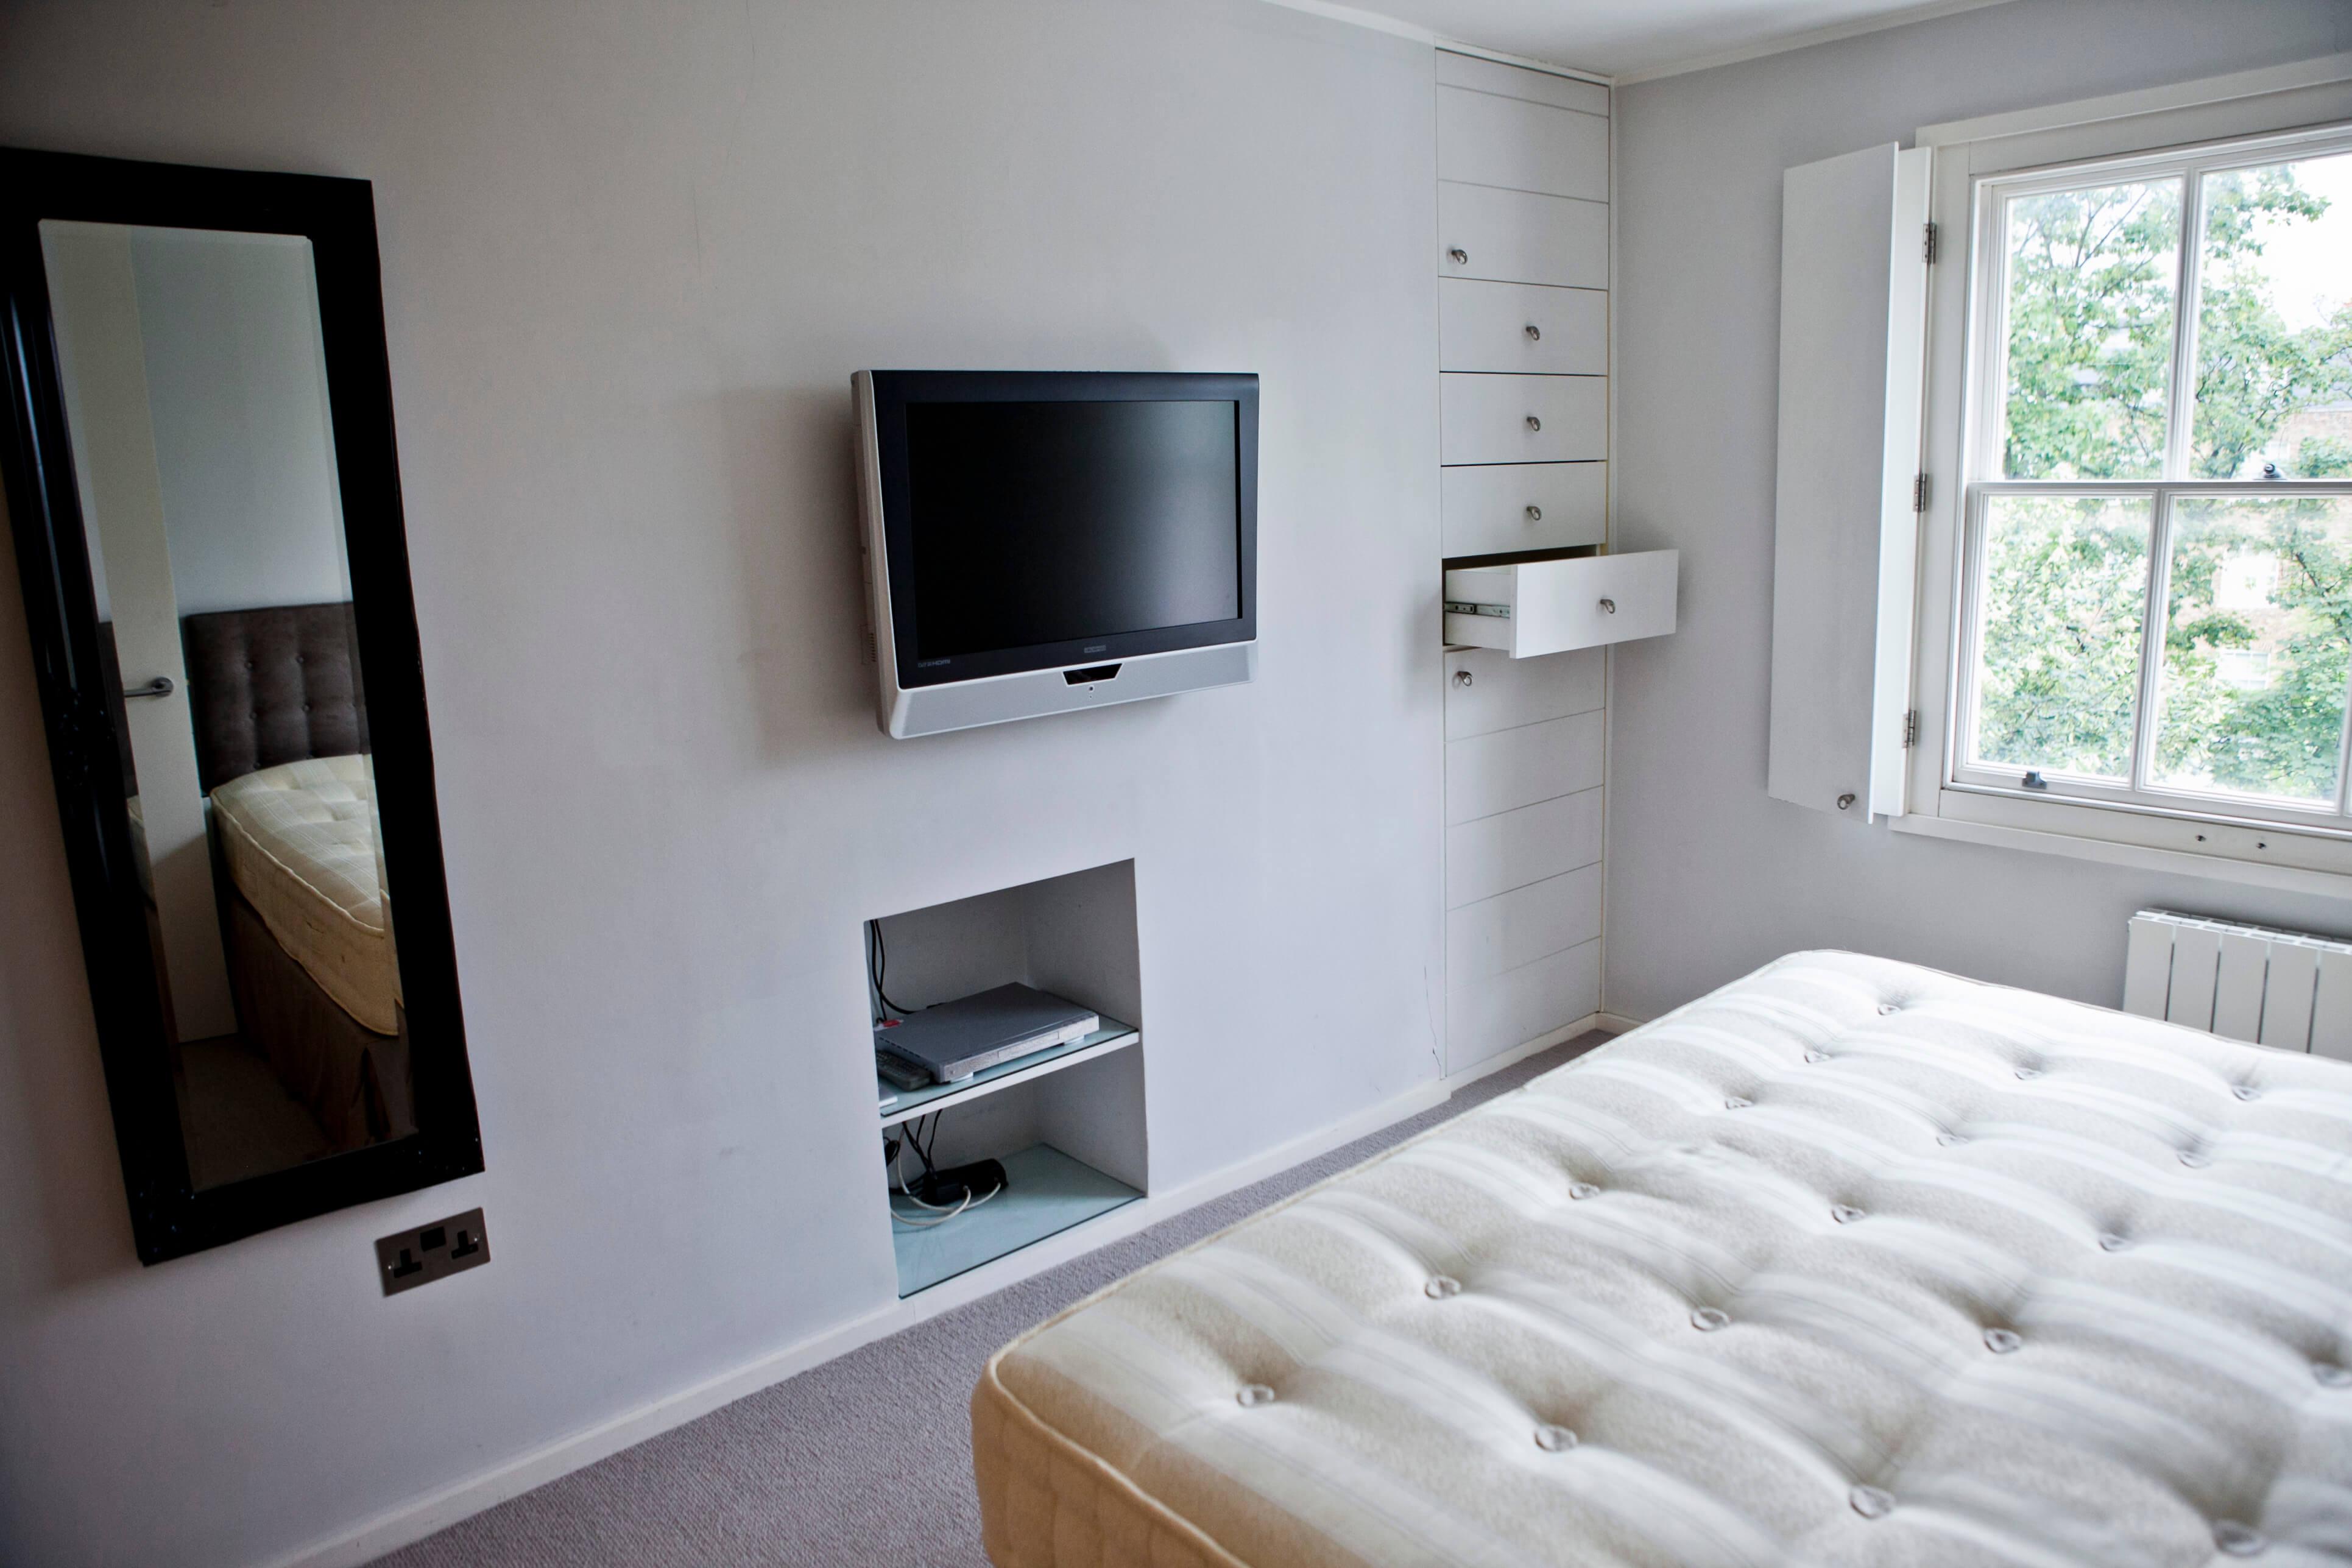 IMG 31011 - Flats & Apartments